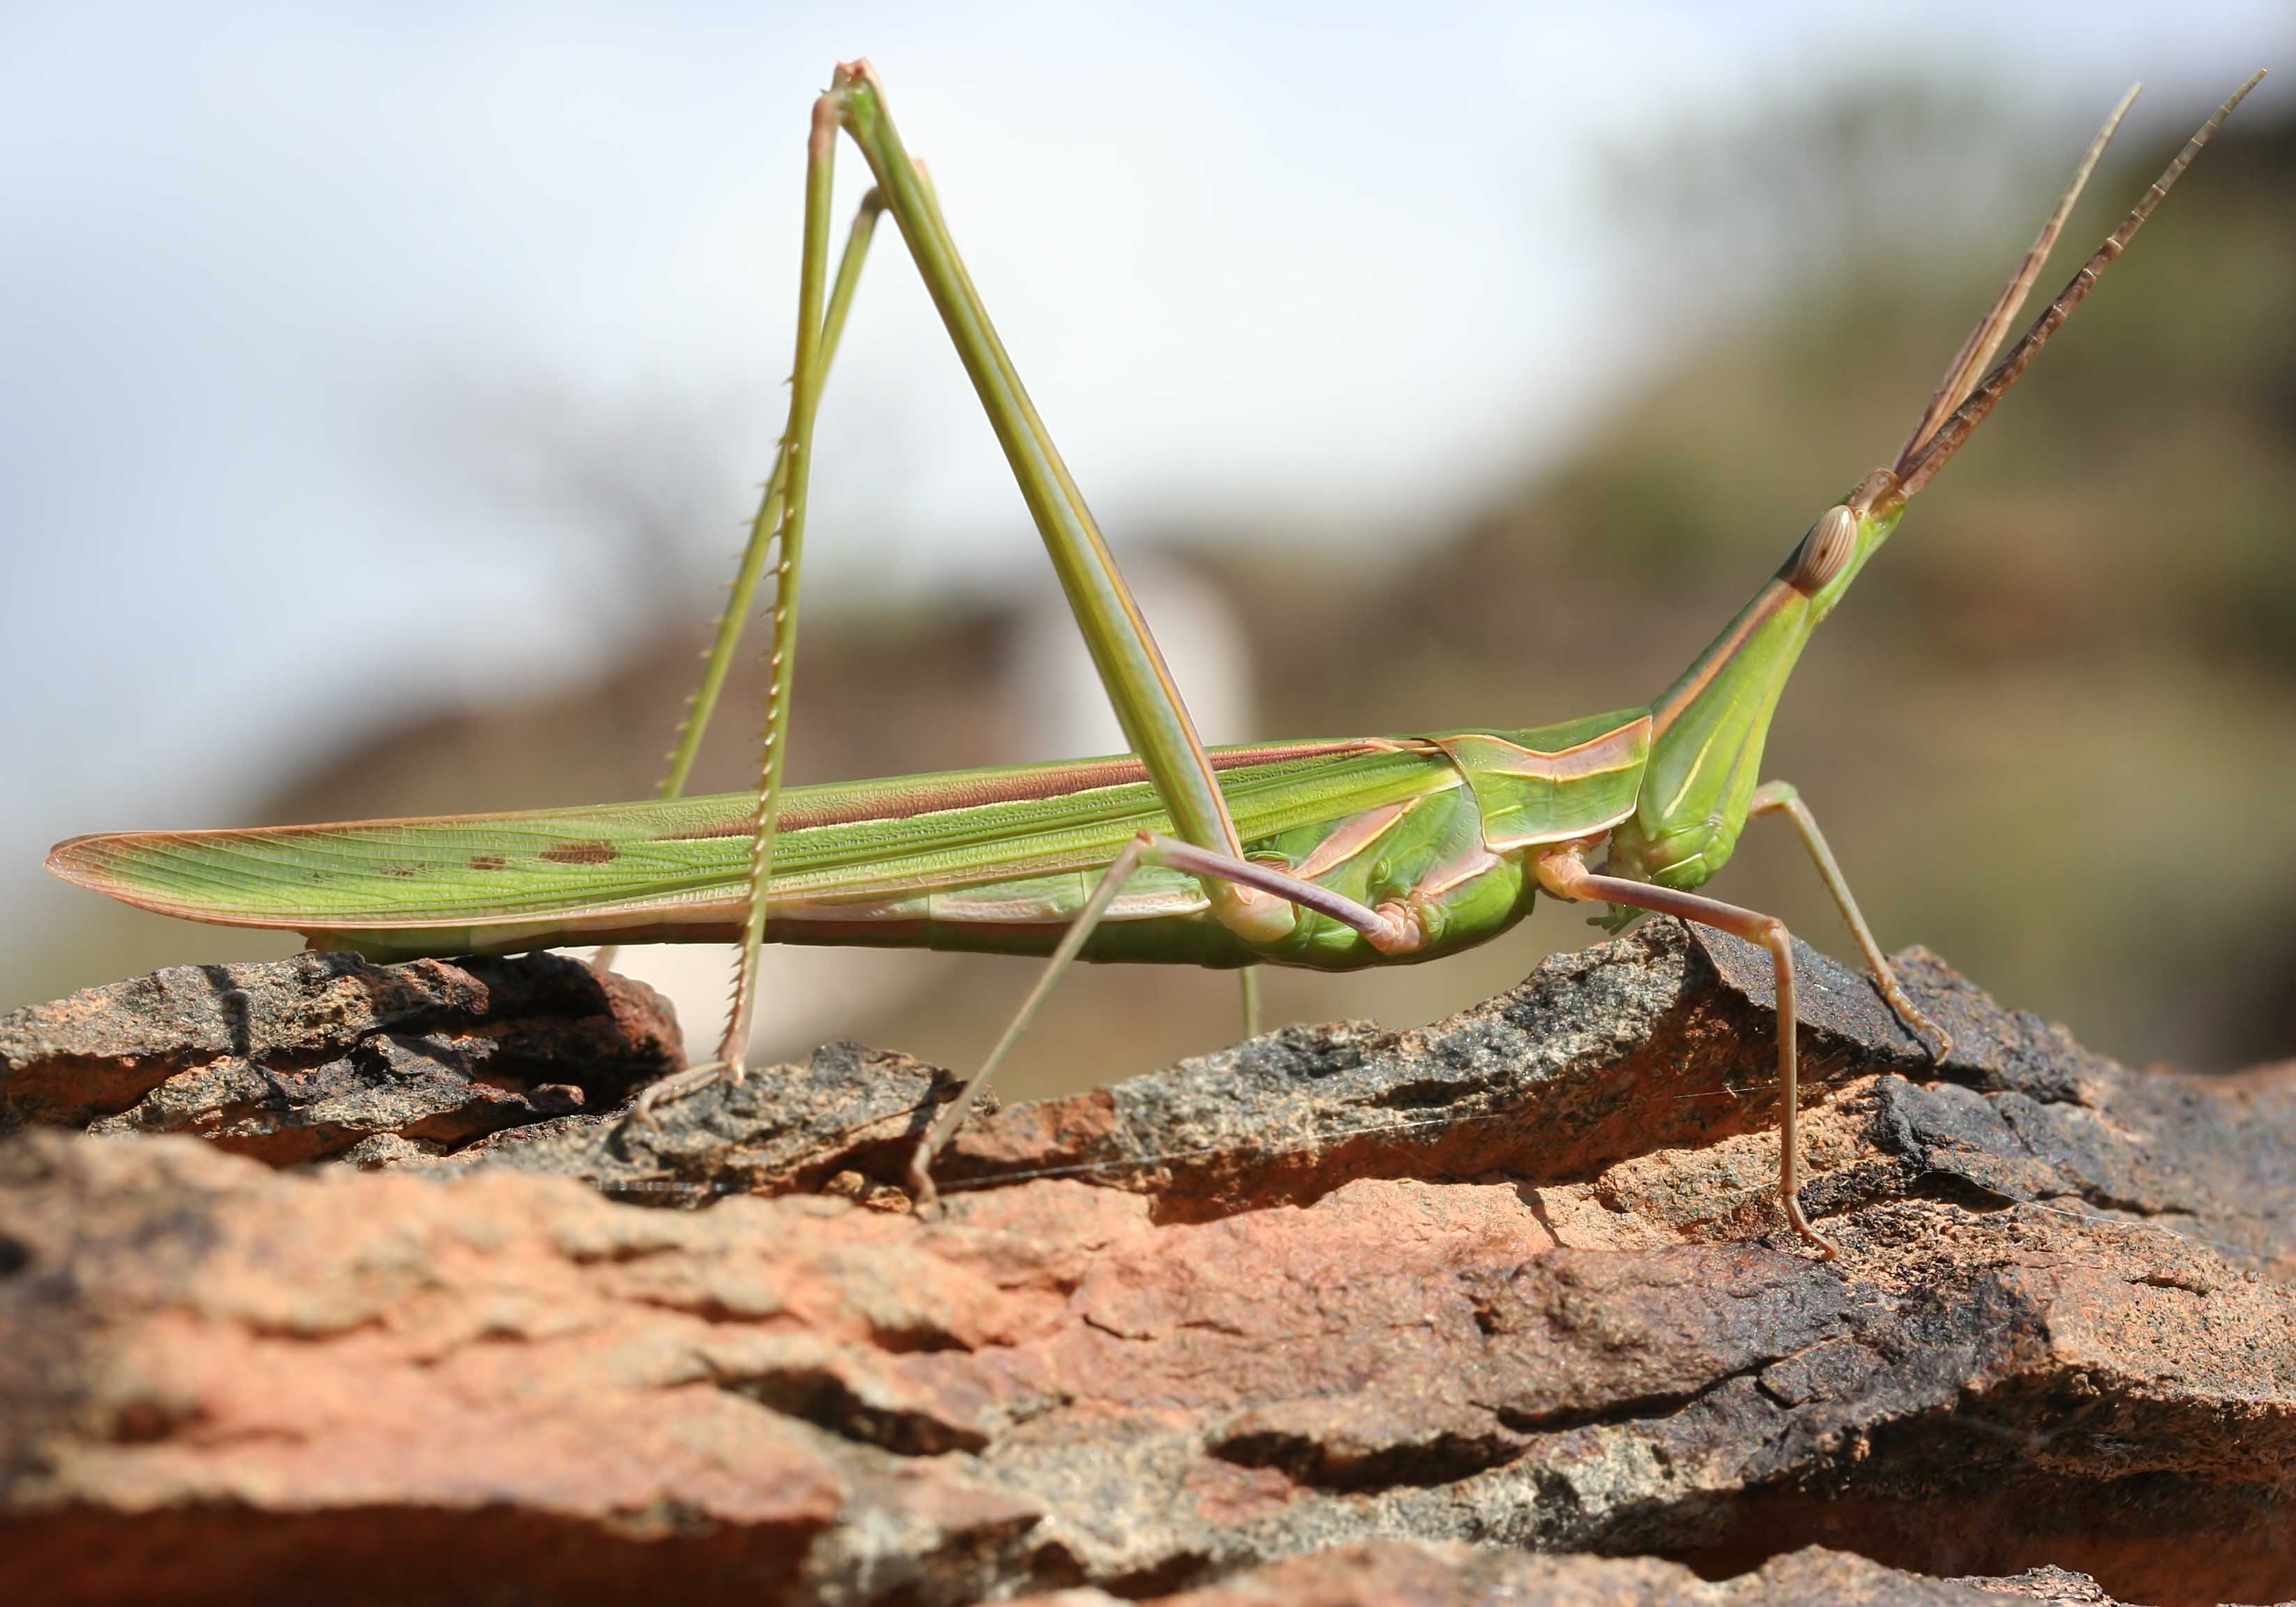 Truxalis nasuta - Nasenschrecke - Fam. Acrididae/Acridinae  -  Gran Canaria - Caelifera - Kurzfühlerschrecken - grasshoppers